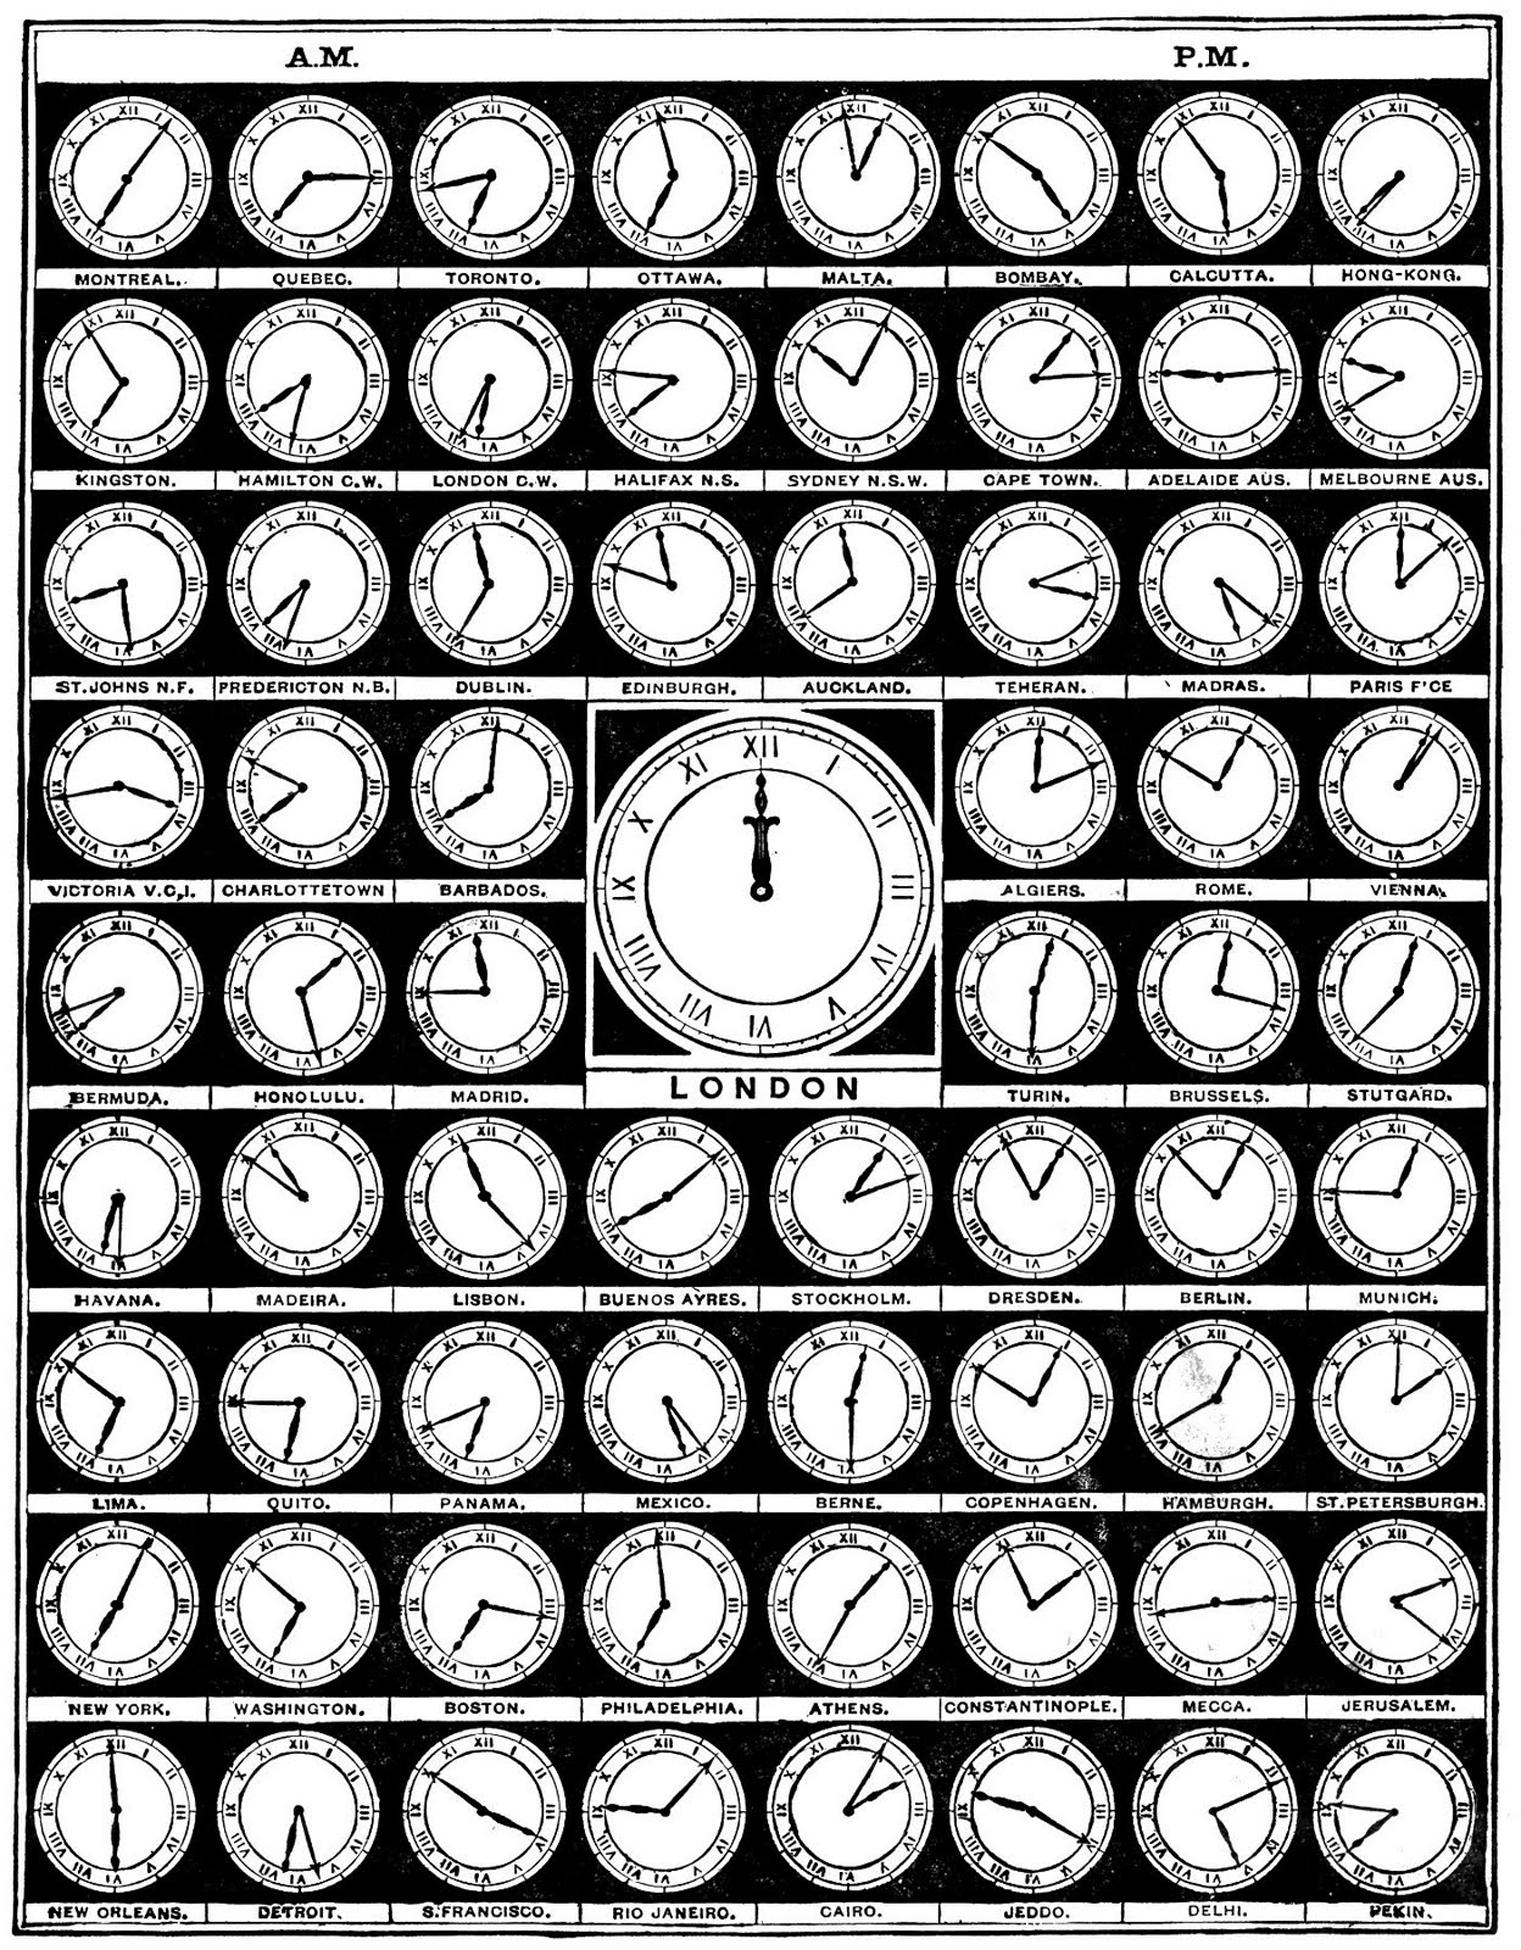 8 Clock Graphics - Vintage Alarm Clocks etc - Updated! - The